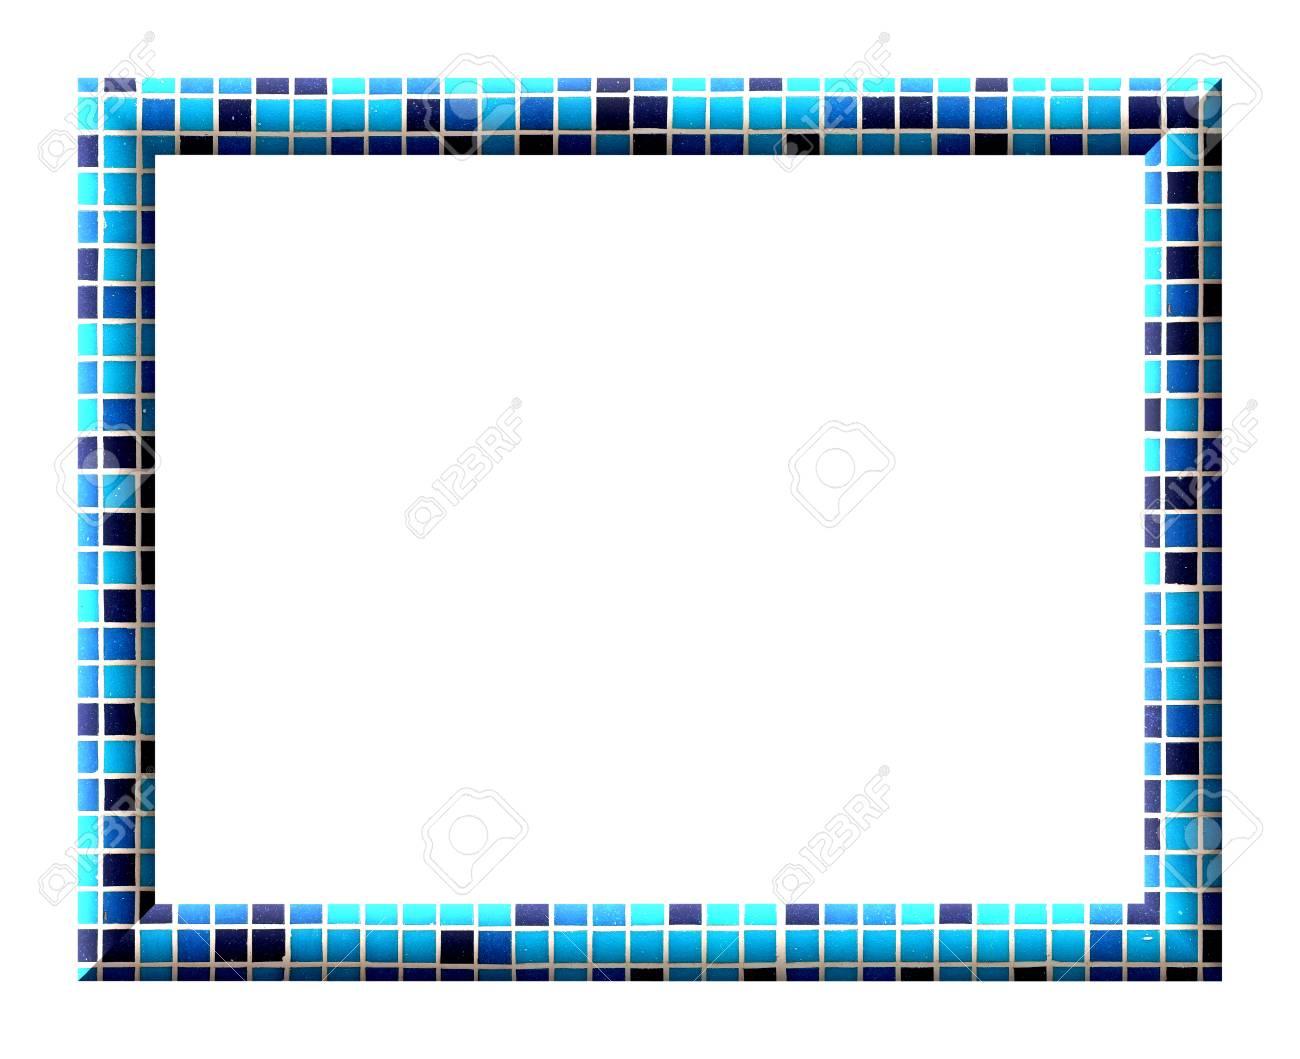 Empty convex rectangular frame with square tiles texture dark empty convex rectangular frame with square tiles texture dark blue light blue and turquoise stock jeuxipadfo Images